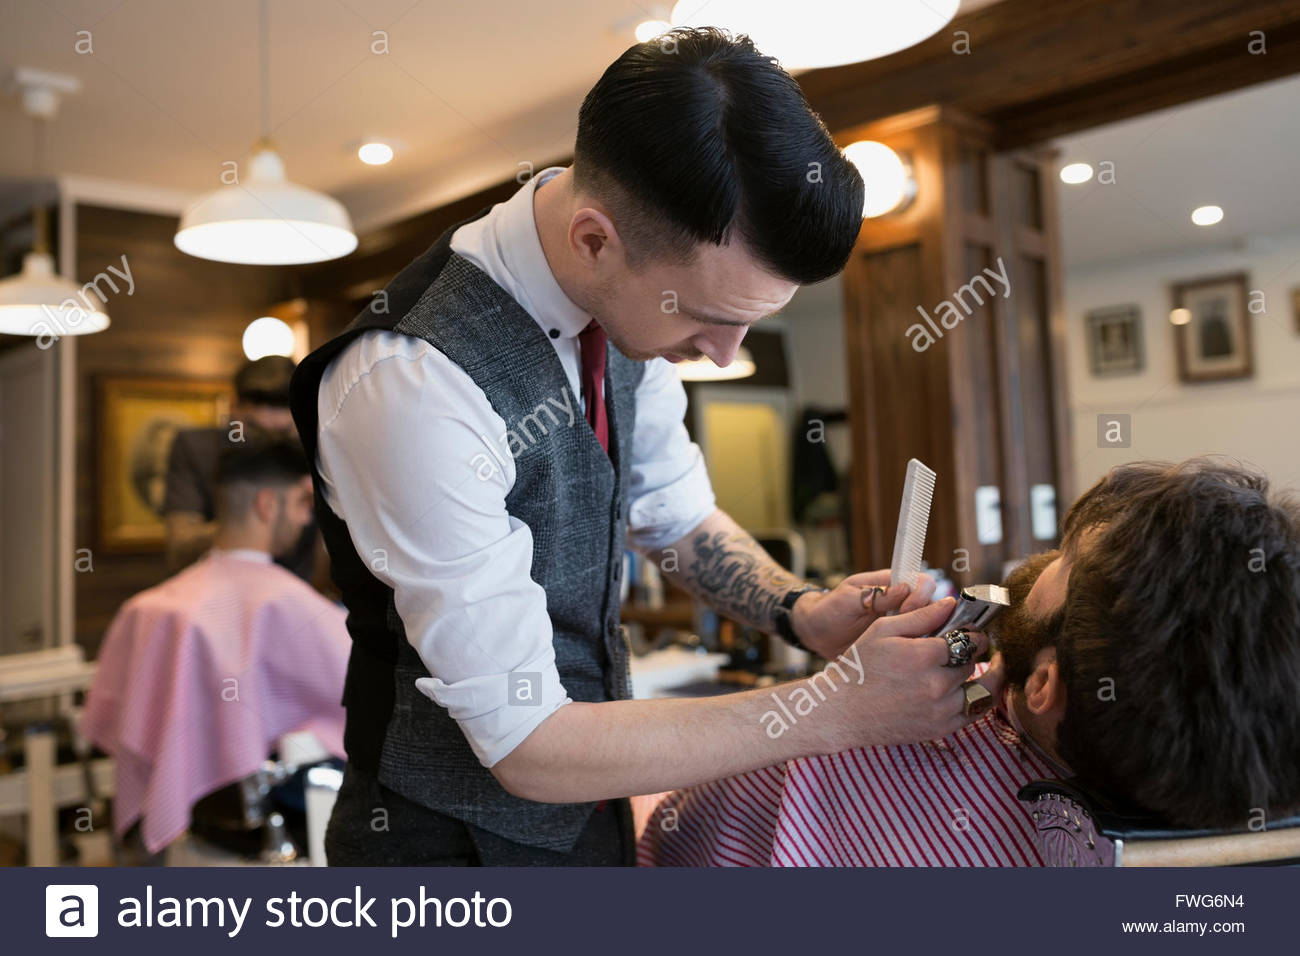 Barber trimming man - Stock Image